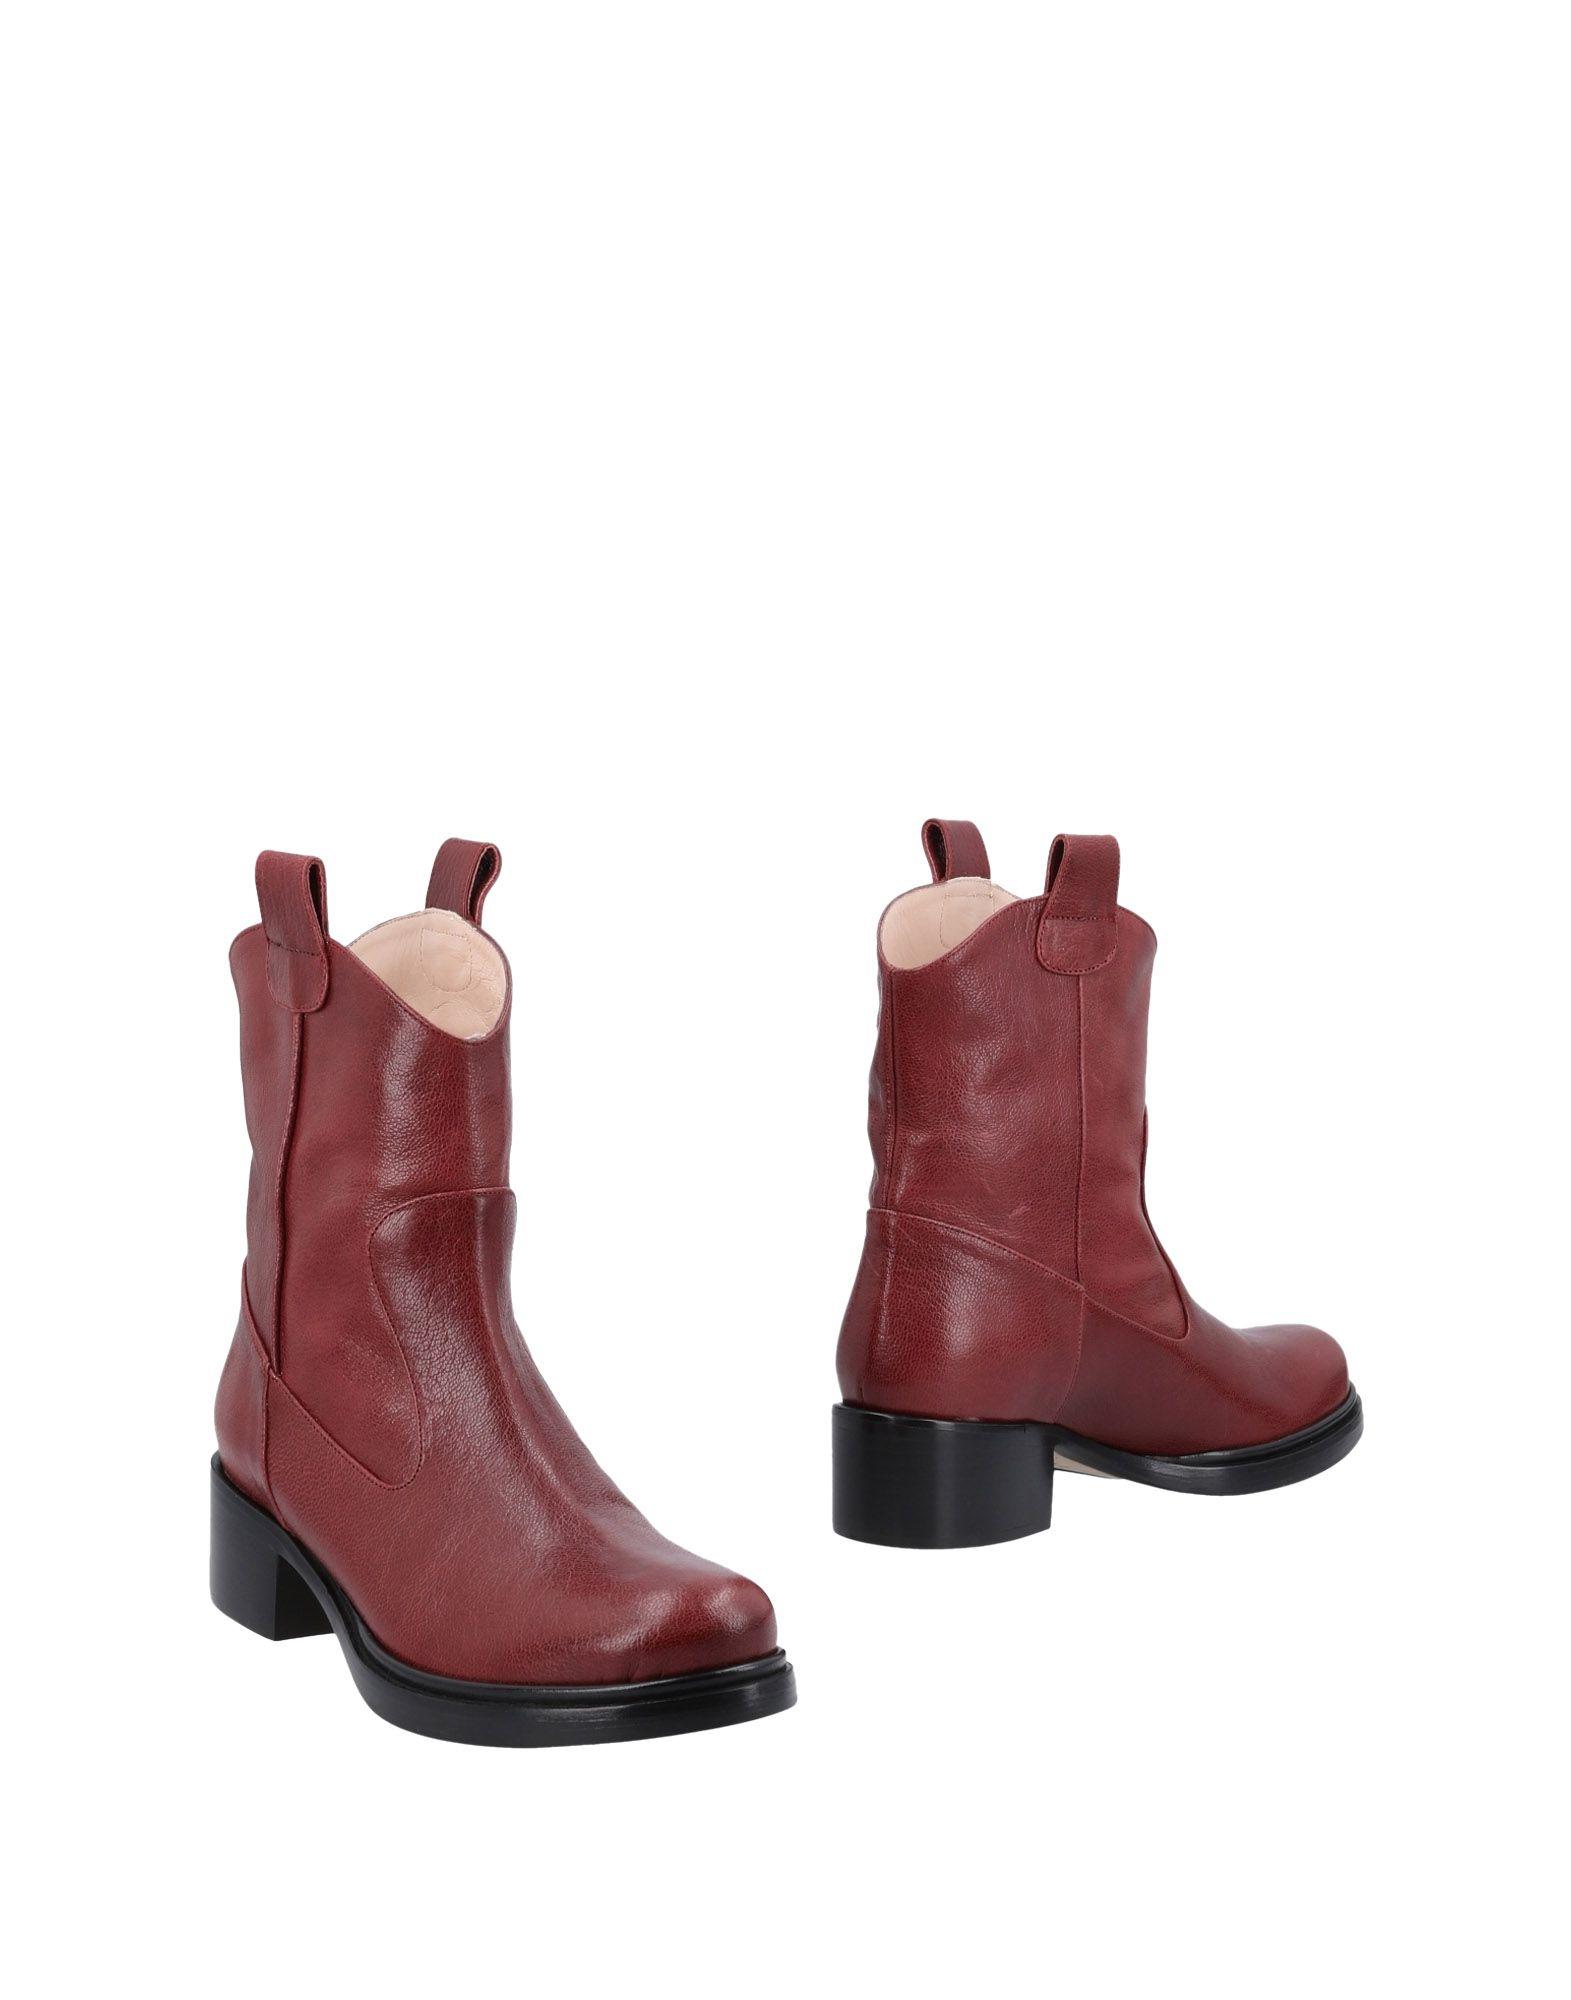 Haltbare Mode billige Schuhe Cavallini  Stiefelette Damen  Cavallini 11483739VH Heiße Schuhe 1f2af8